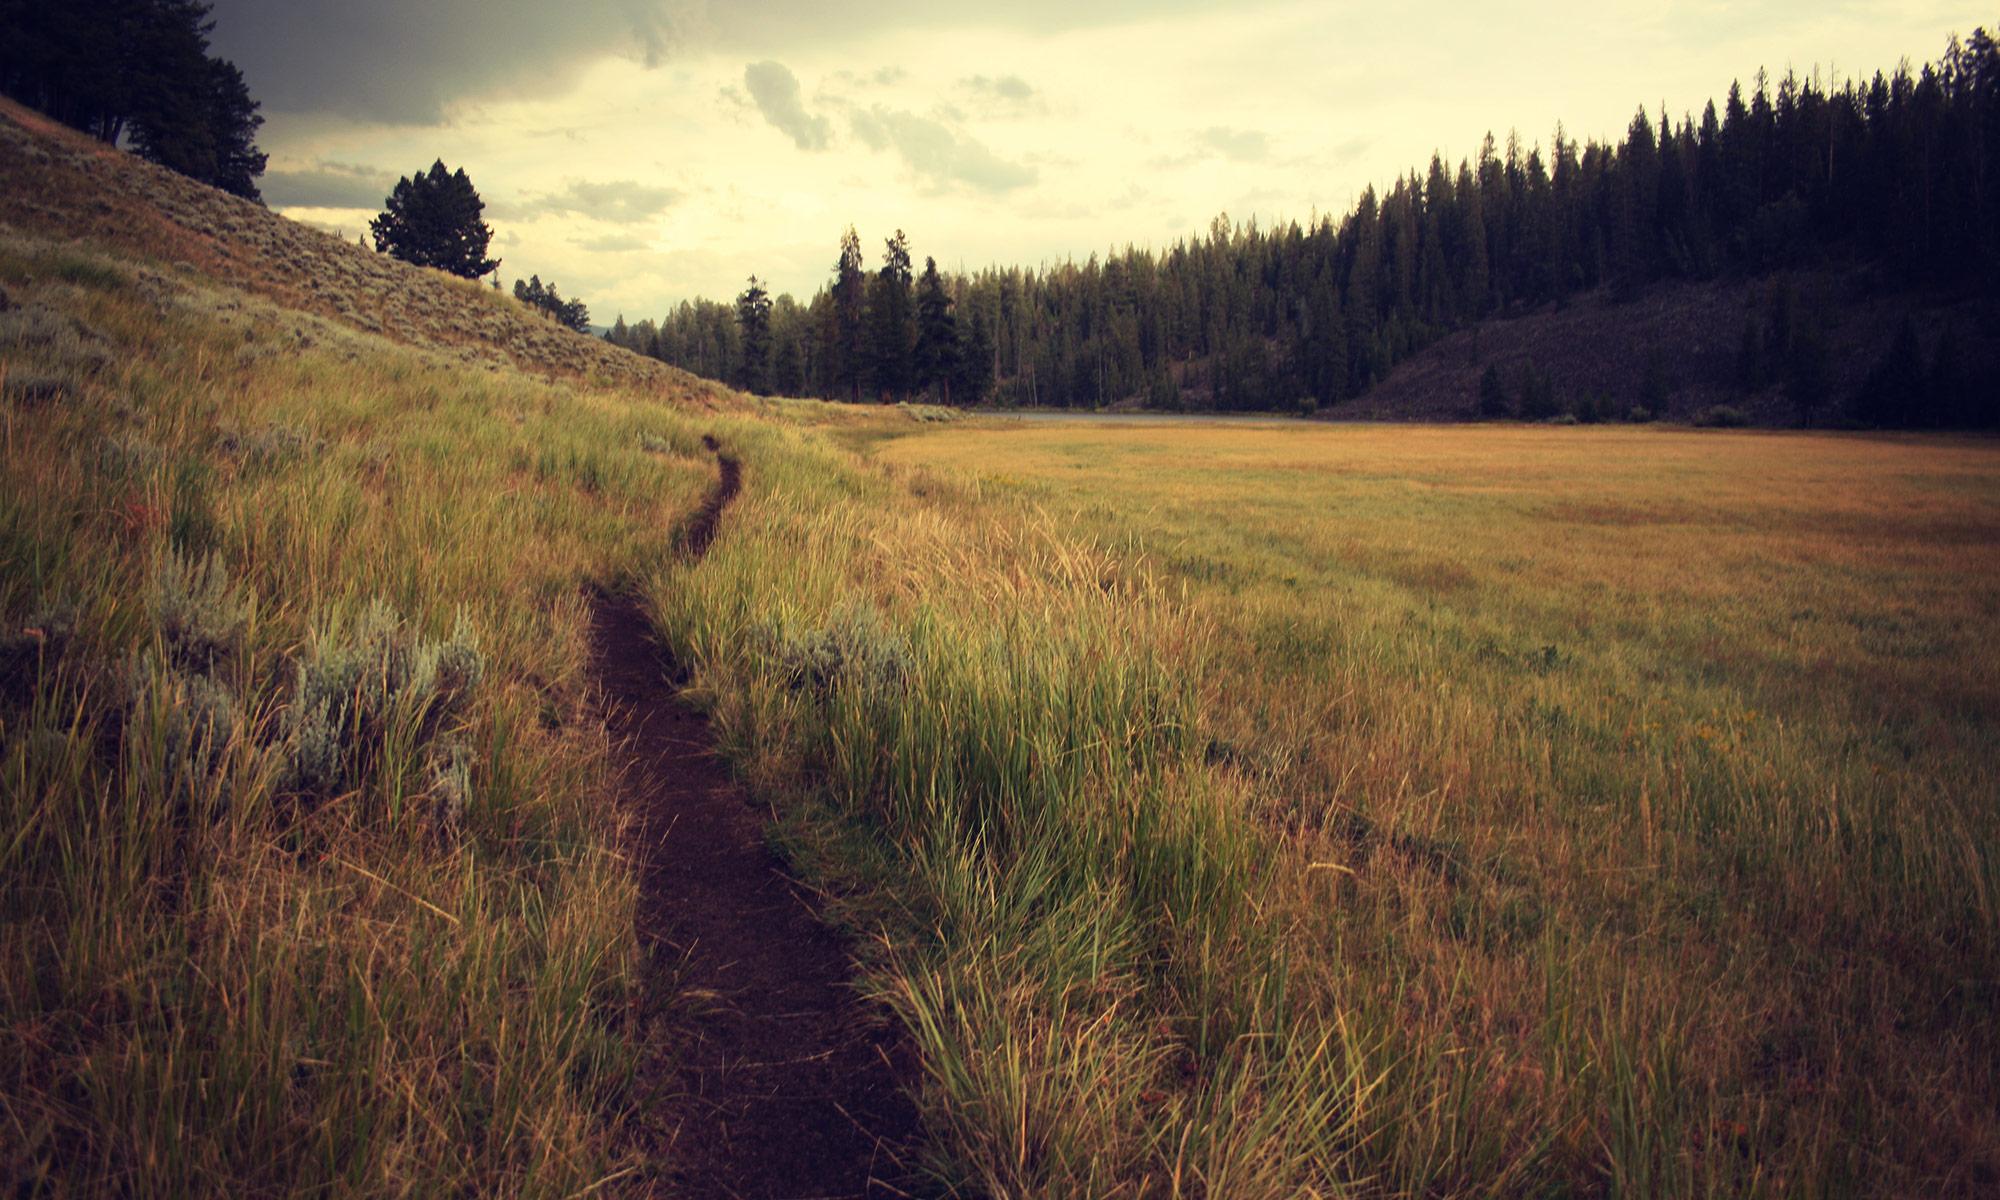 Singlewide trails